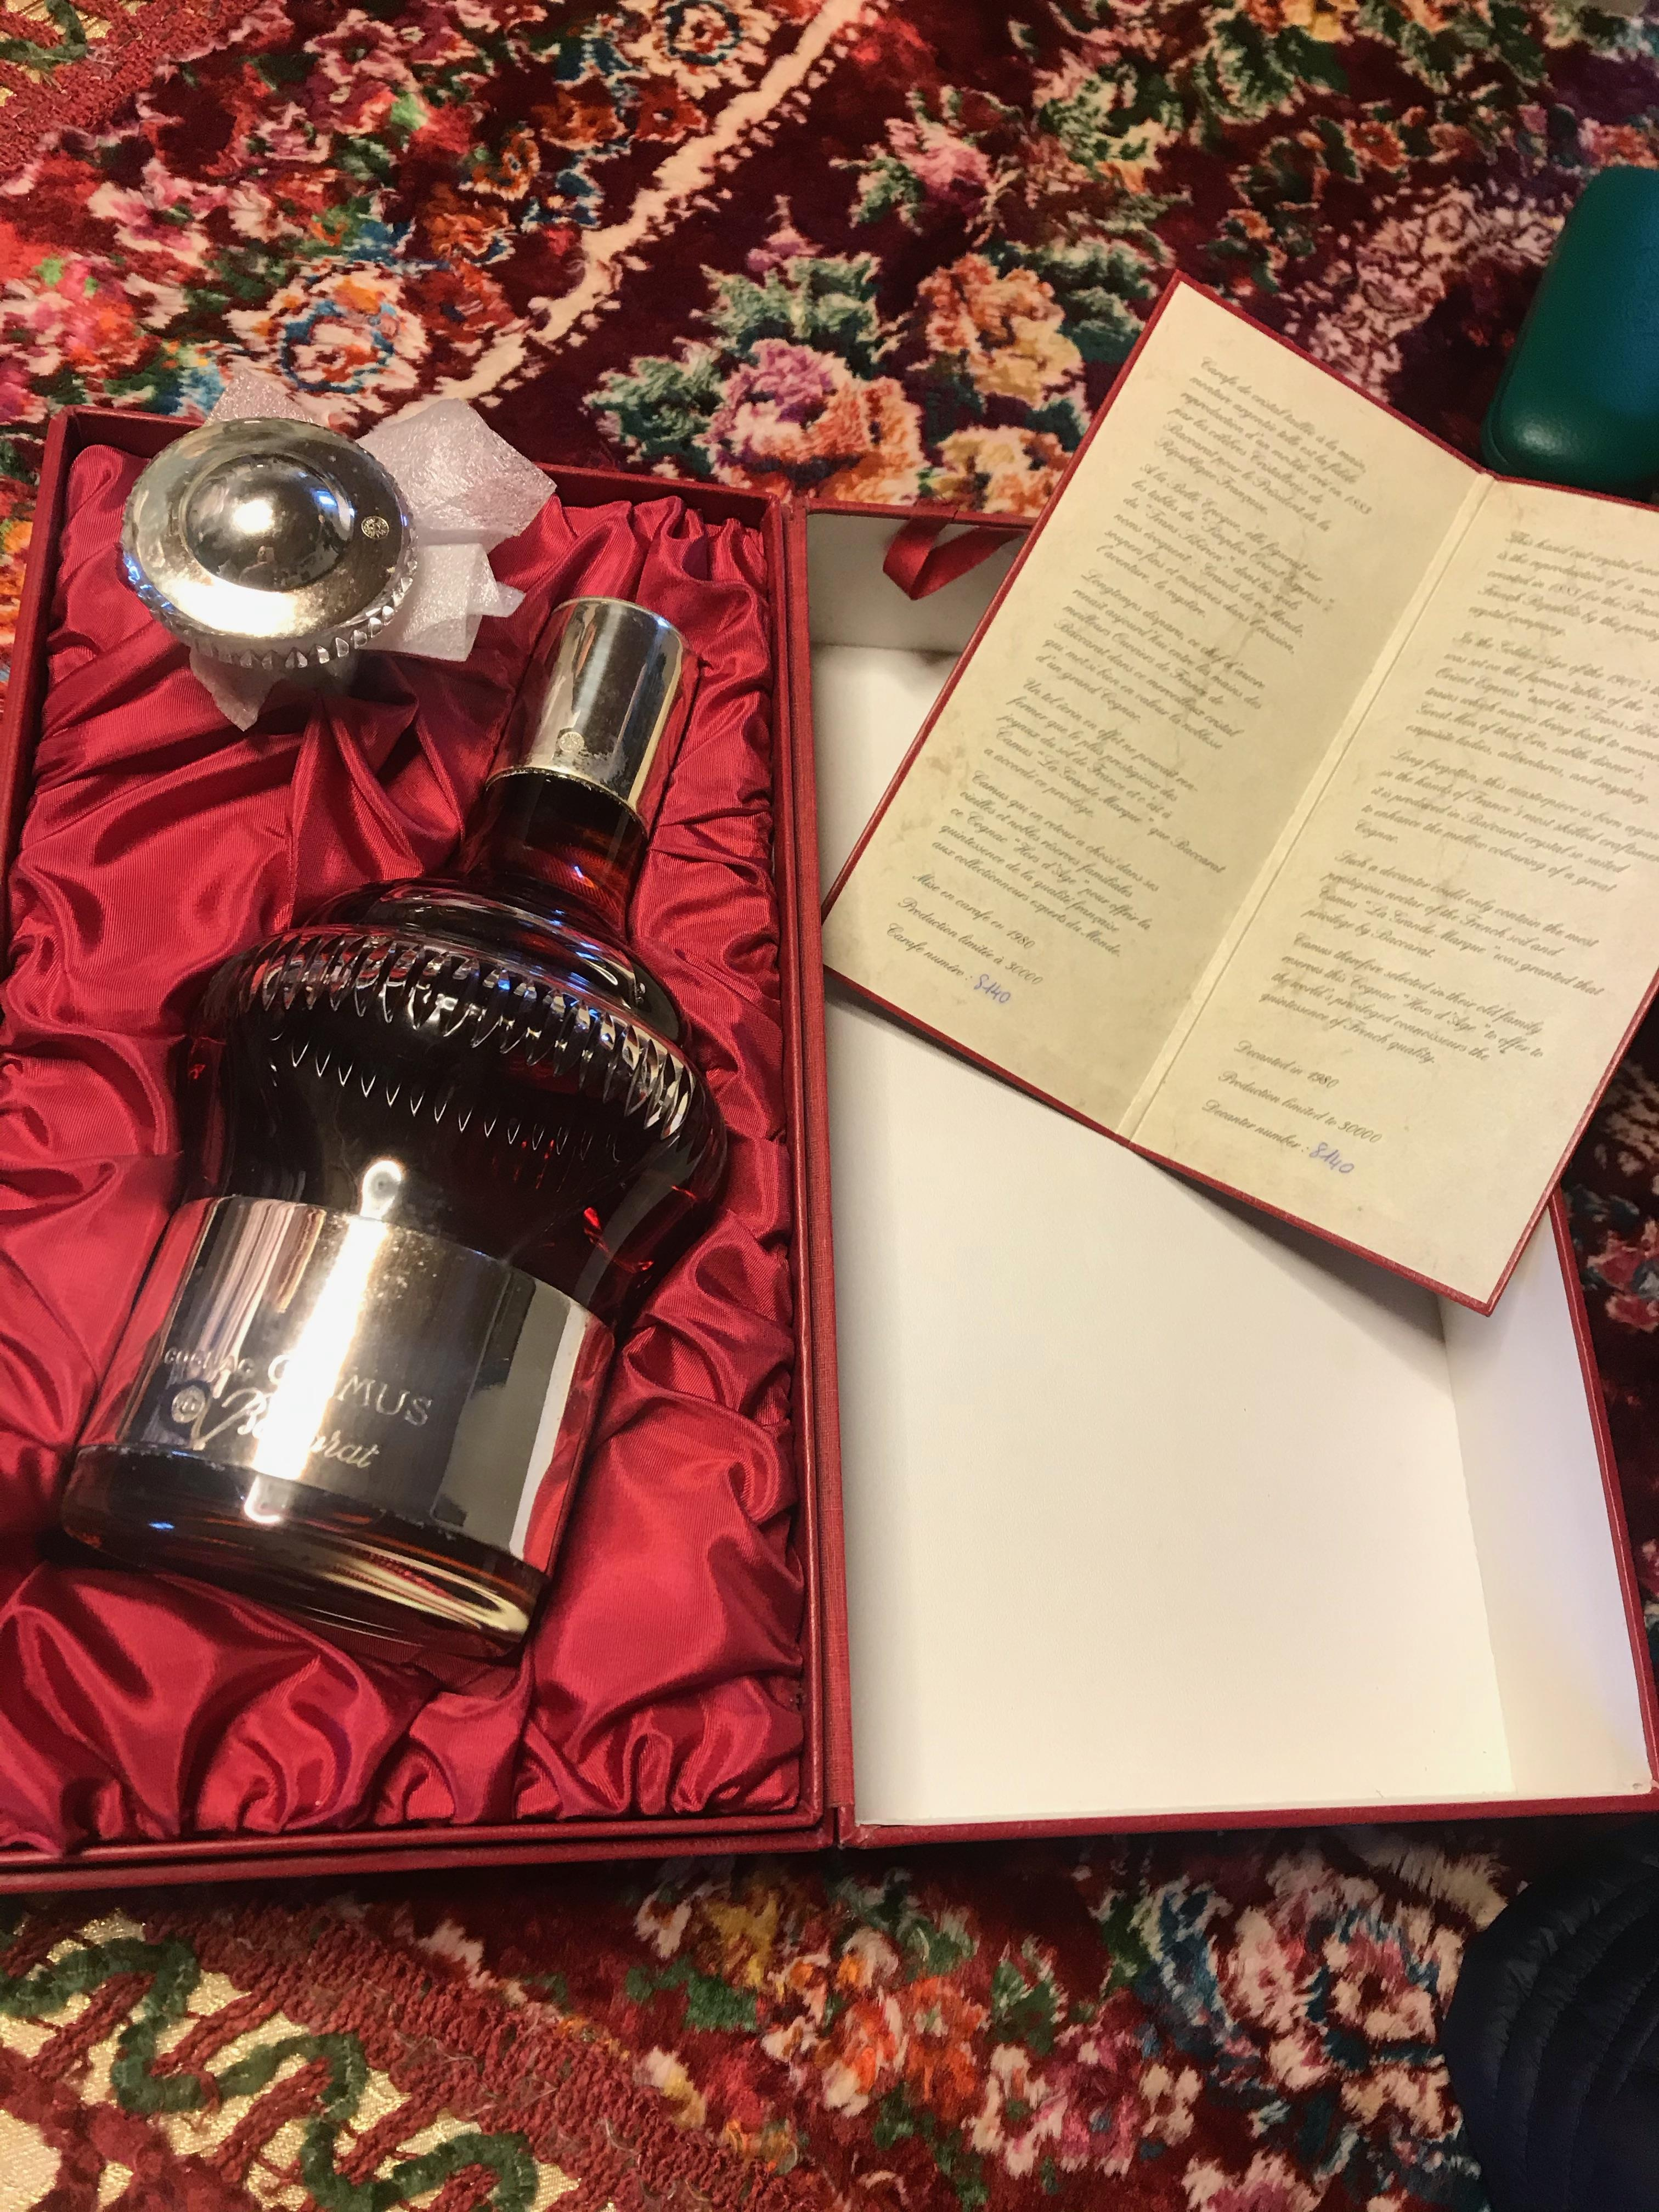 Bottle of Camus Cognac by Baccarat in original presentation case. - Image 4 of 5